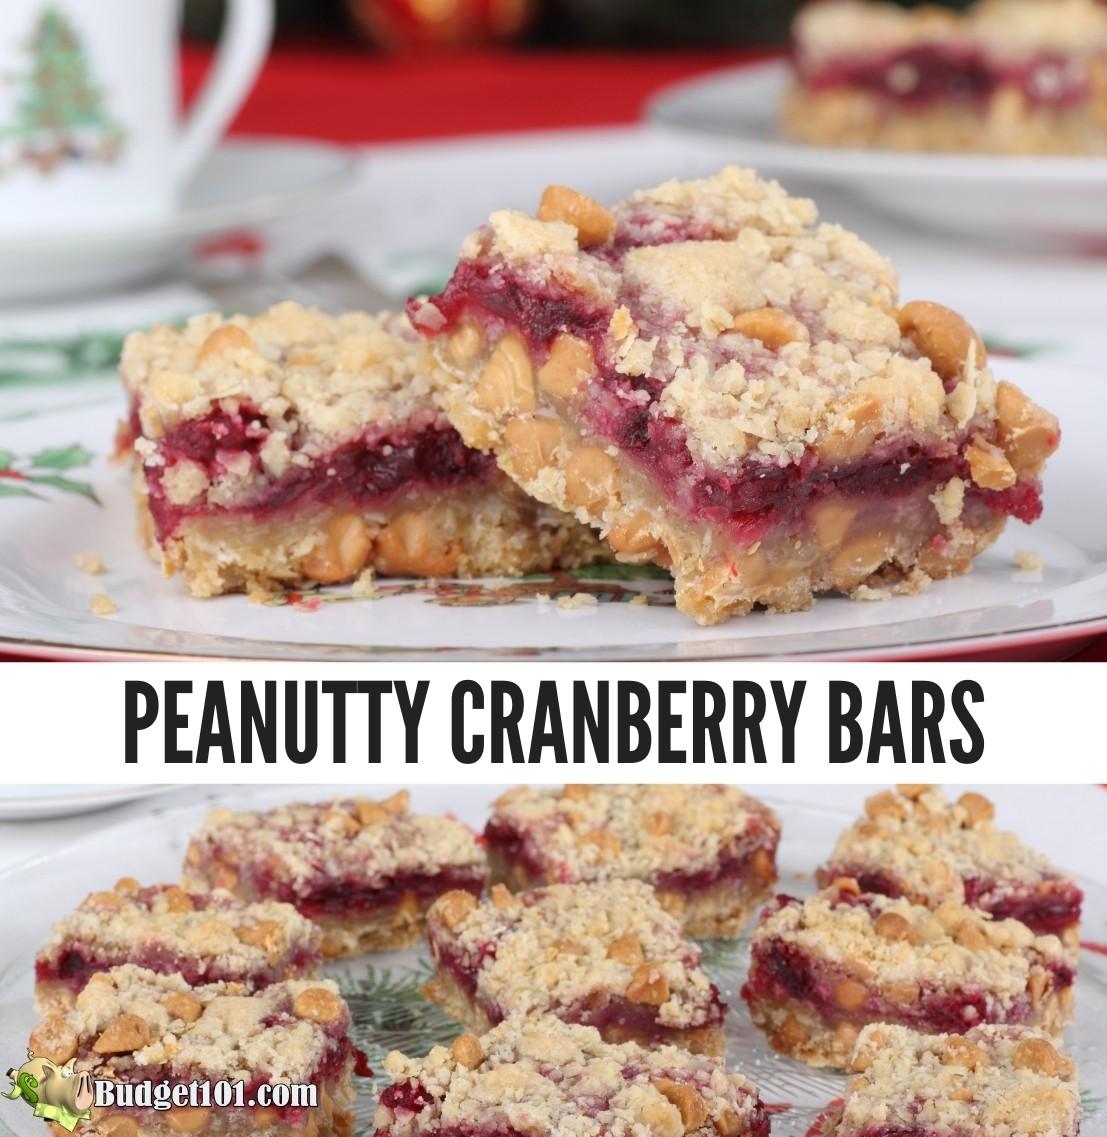 b101 peanutty cranberry bars